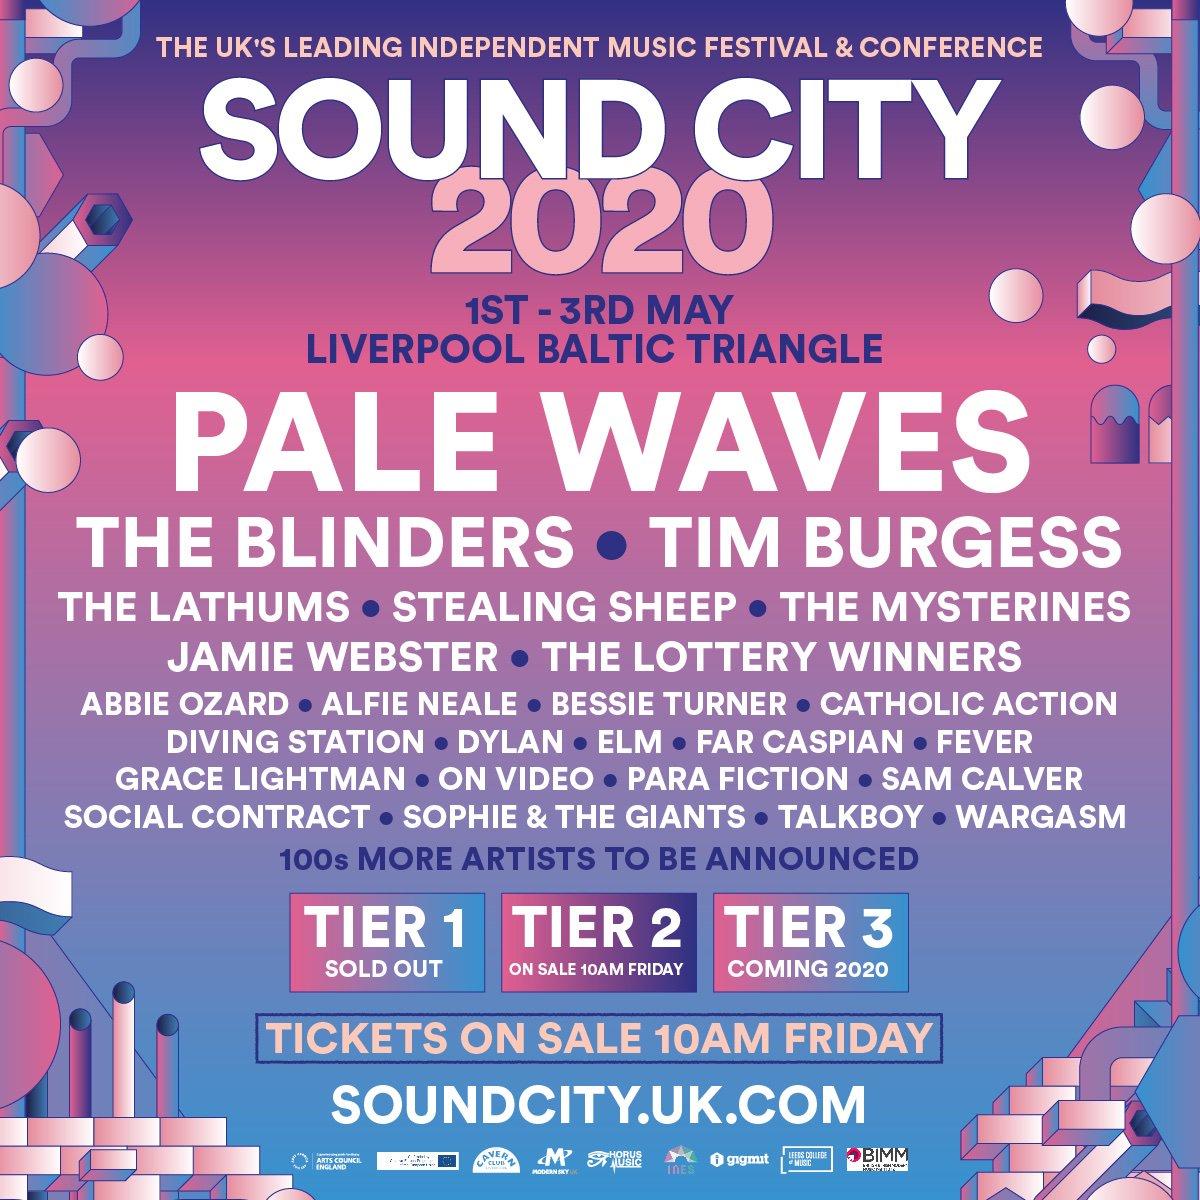 Events Sc 2020.Sound City 2020 Lvrpl Circlekj